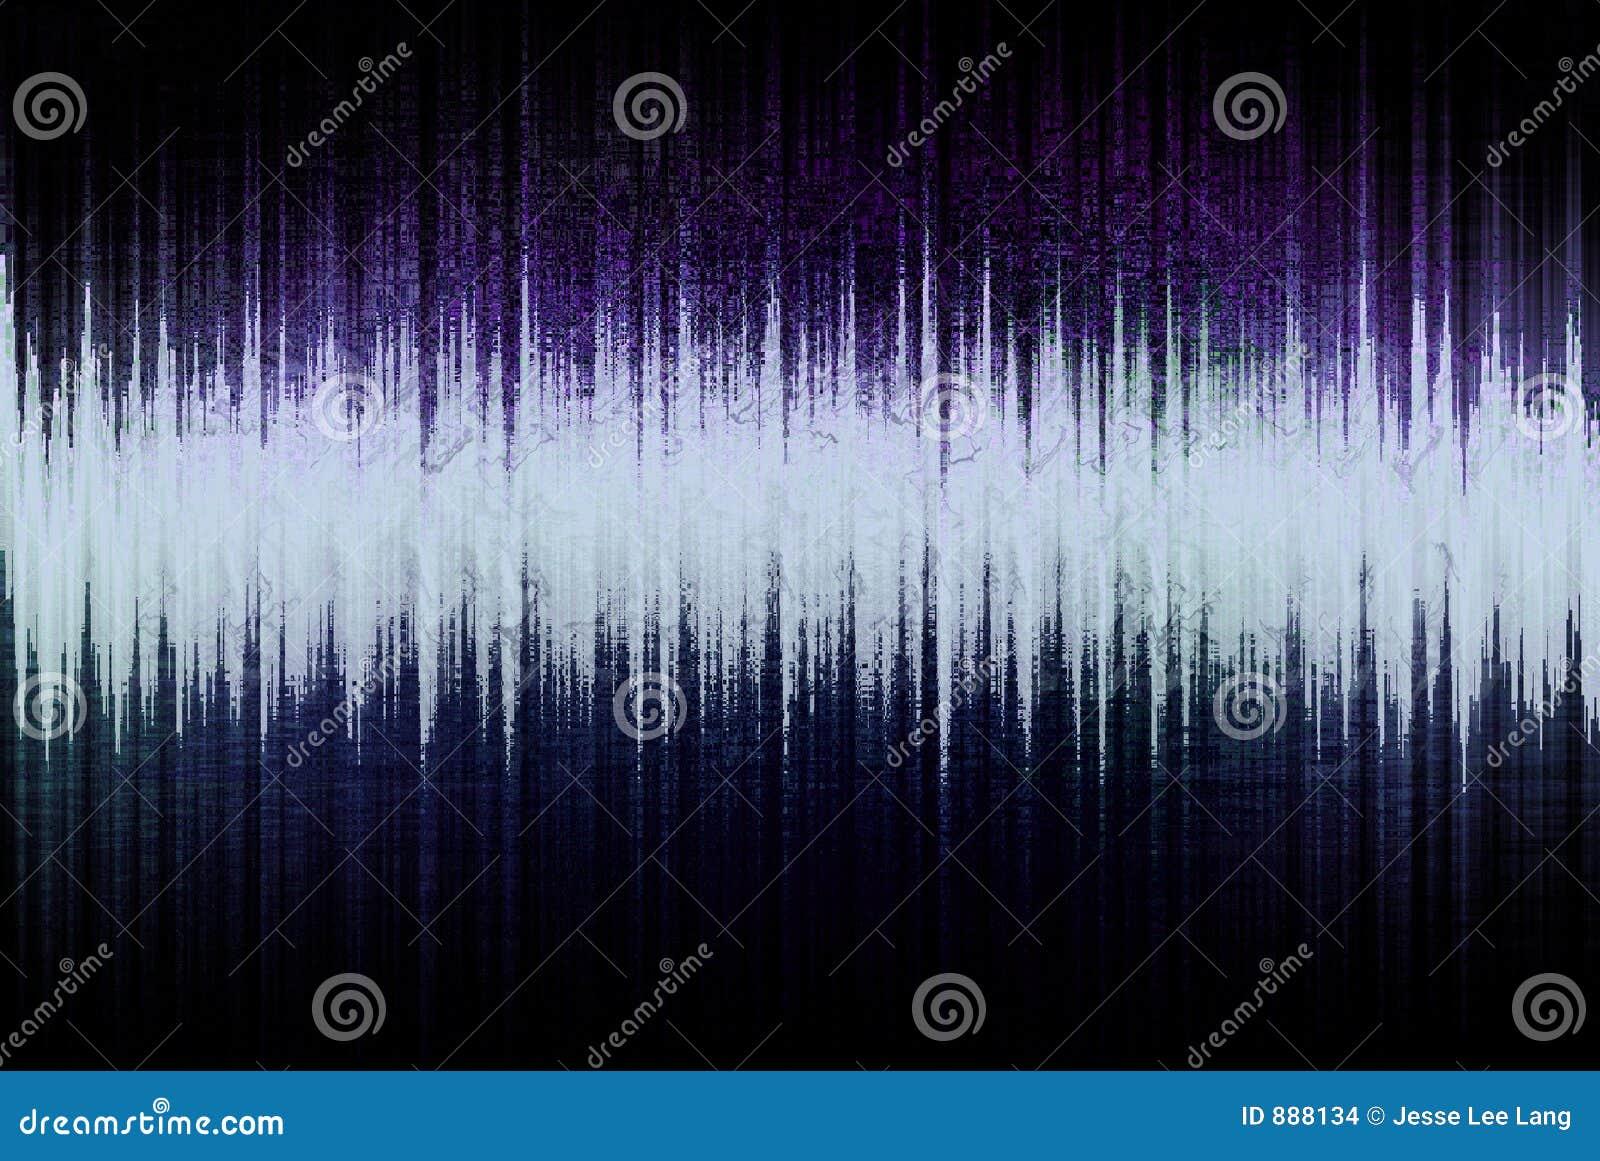 Formularze fale dźwięku